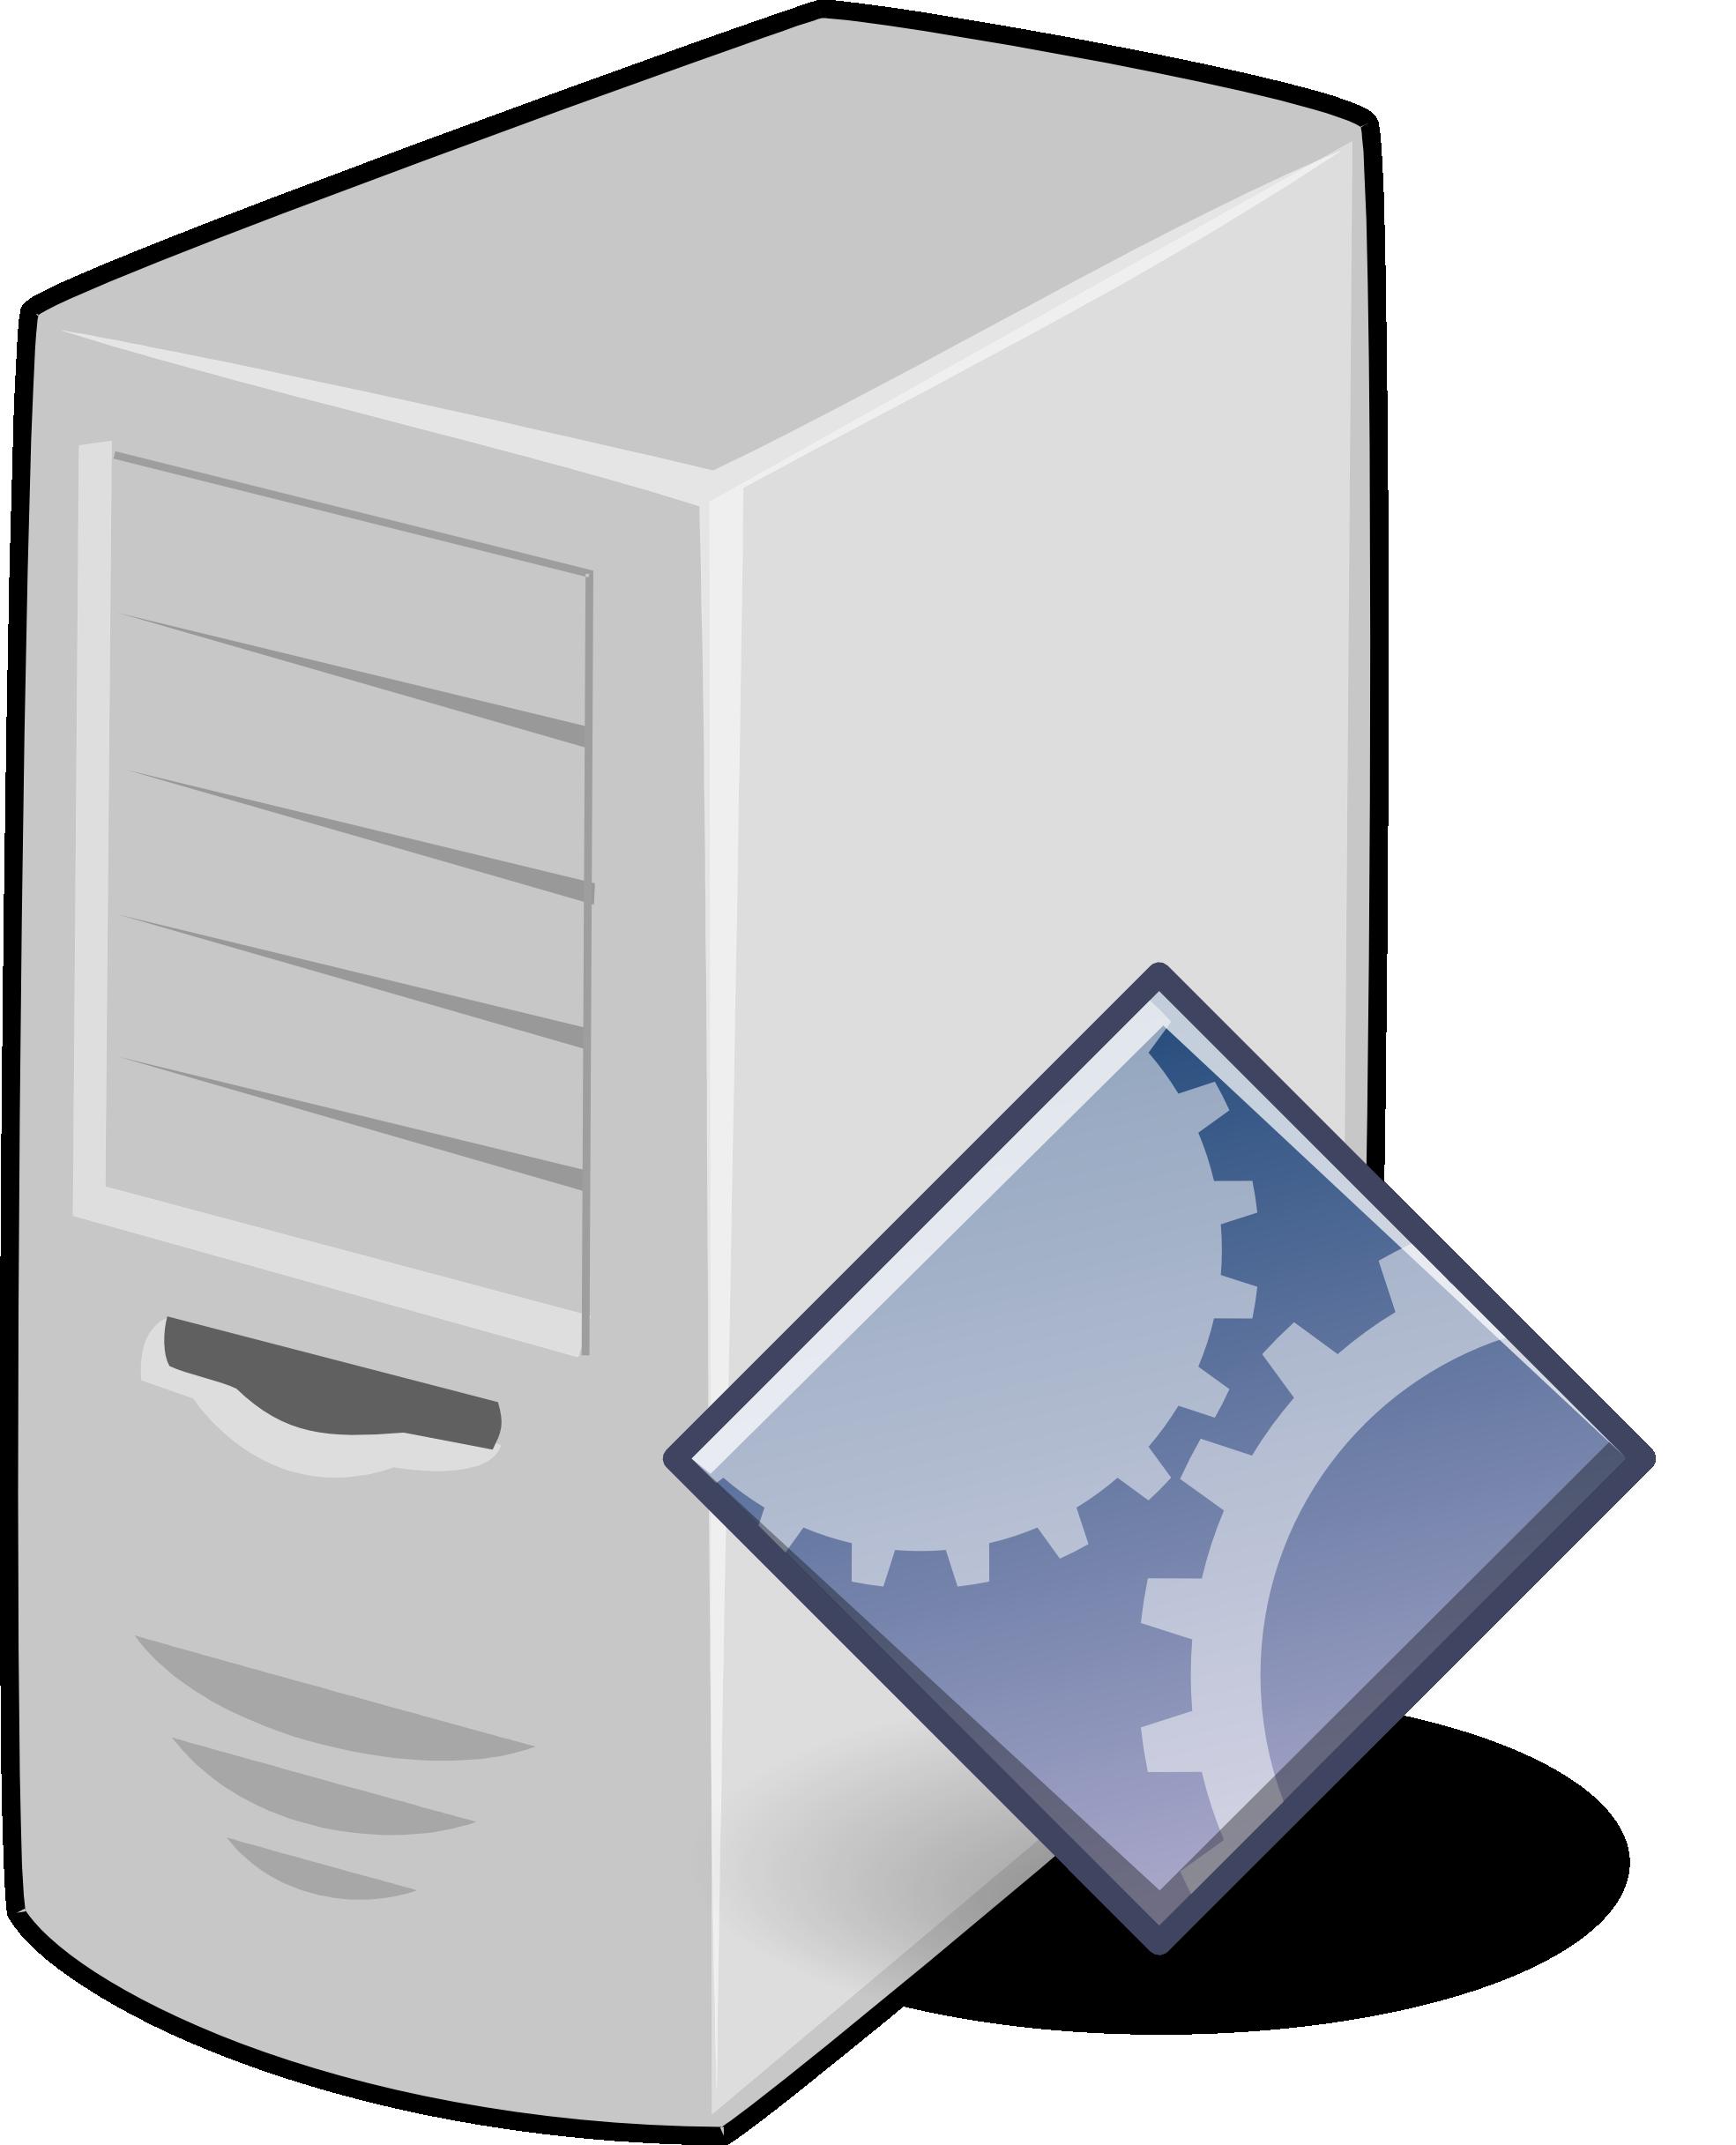 Server Clipart & Server Clip Art Images.